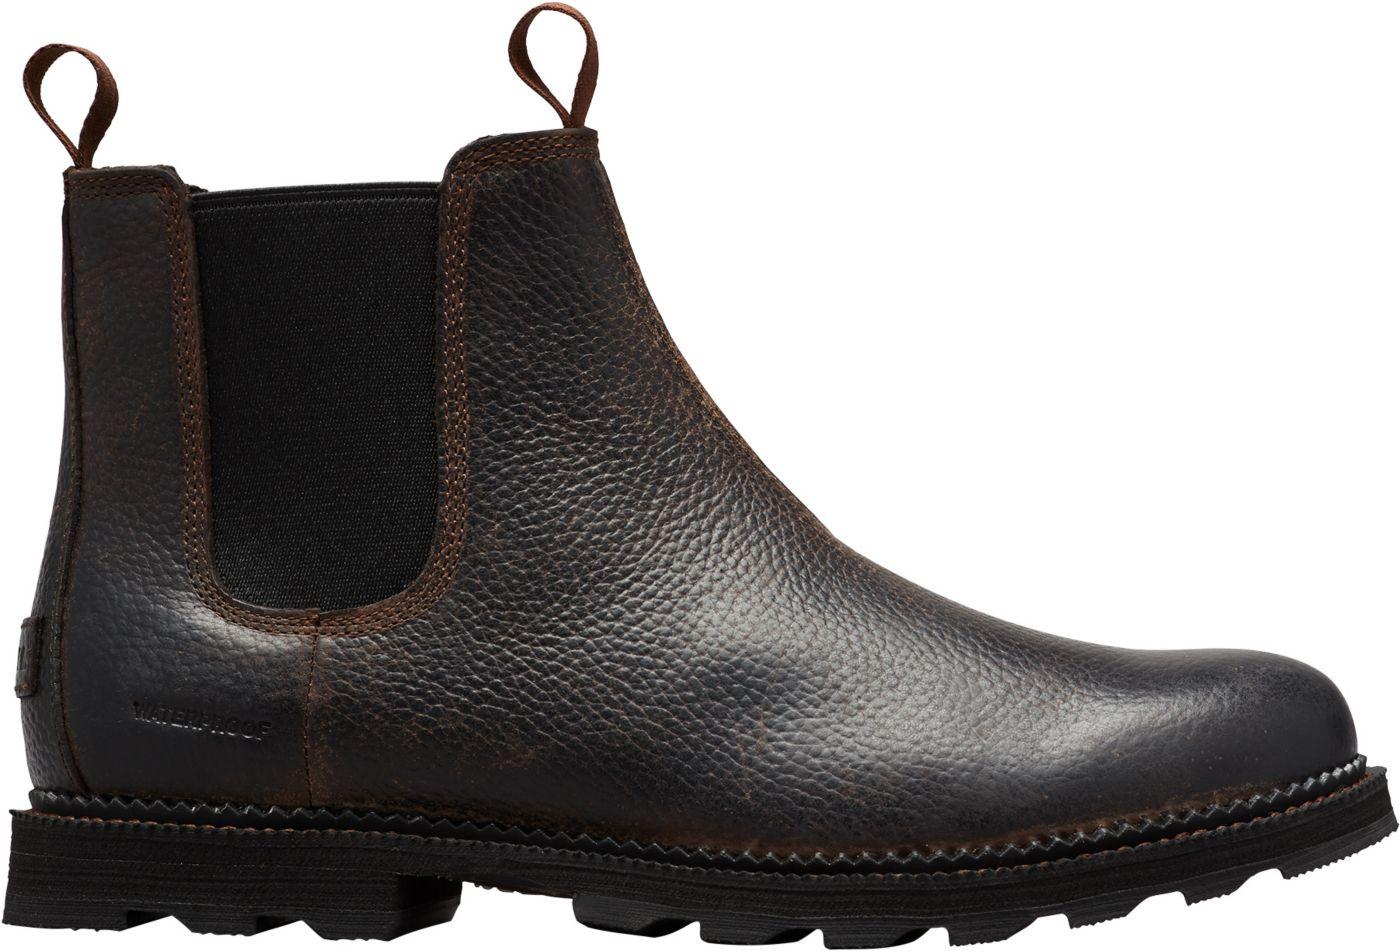 SOREL Men's Madson Chelsea Waterproof Casual Boots